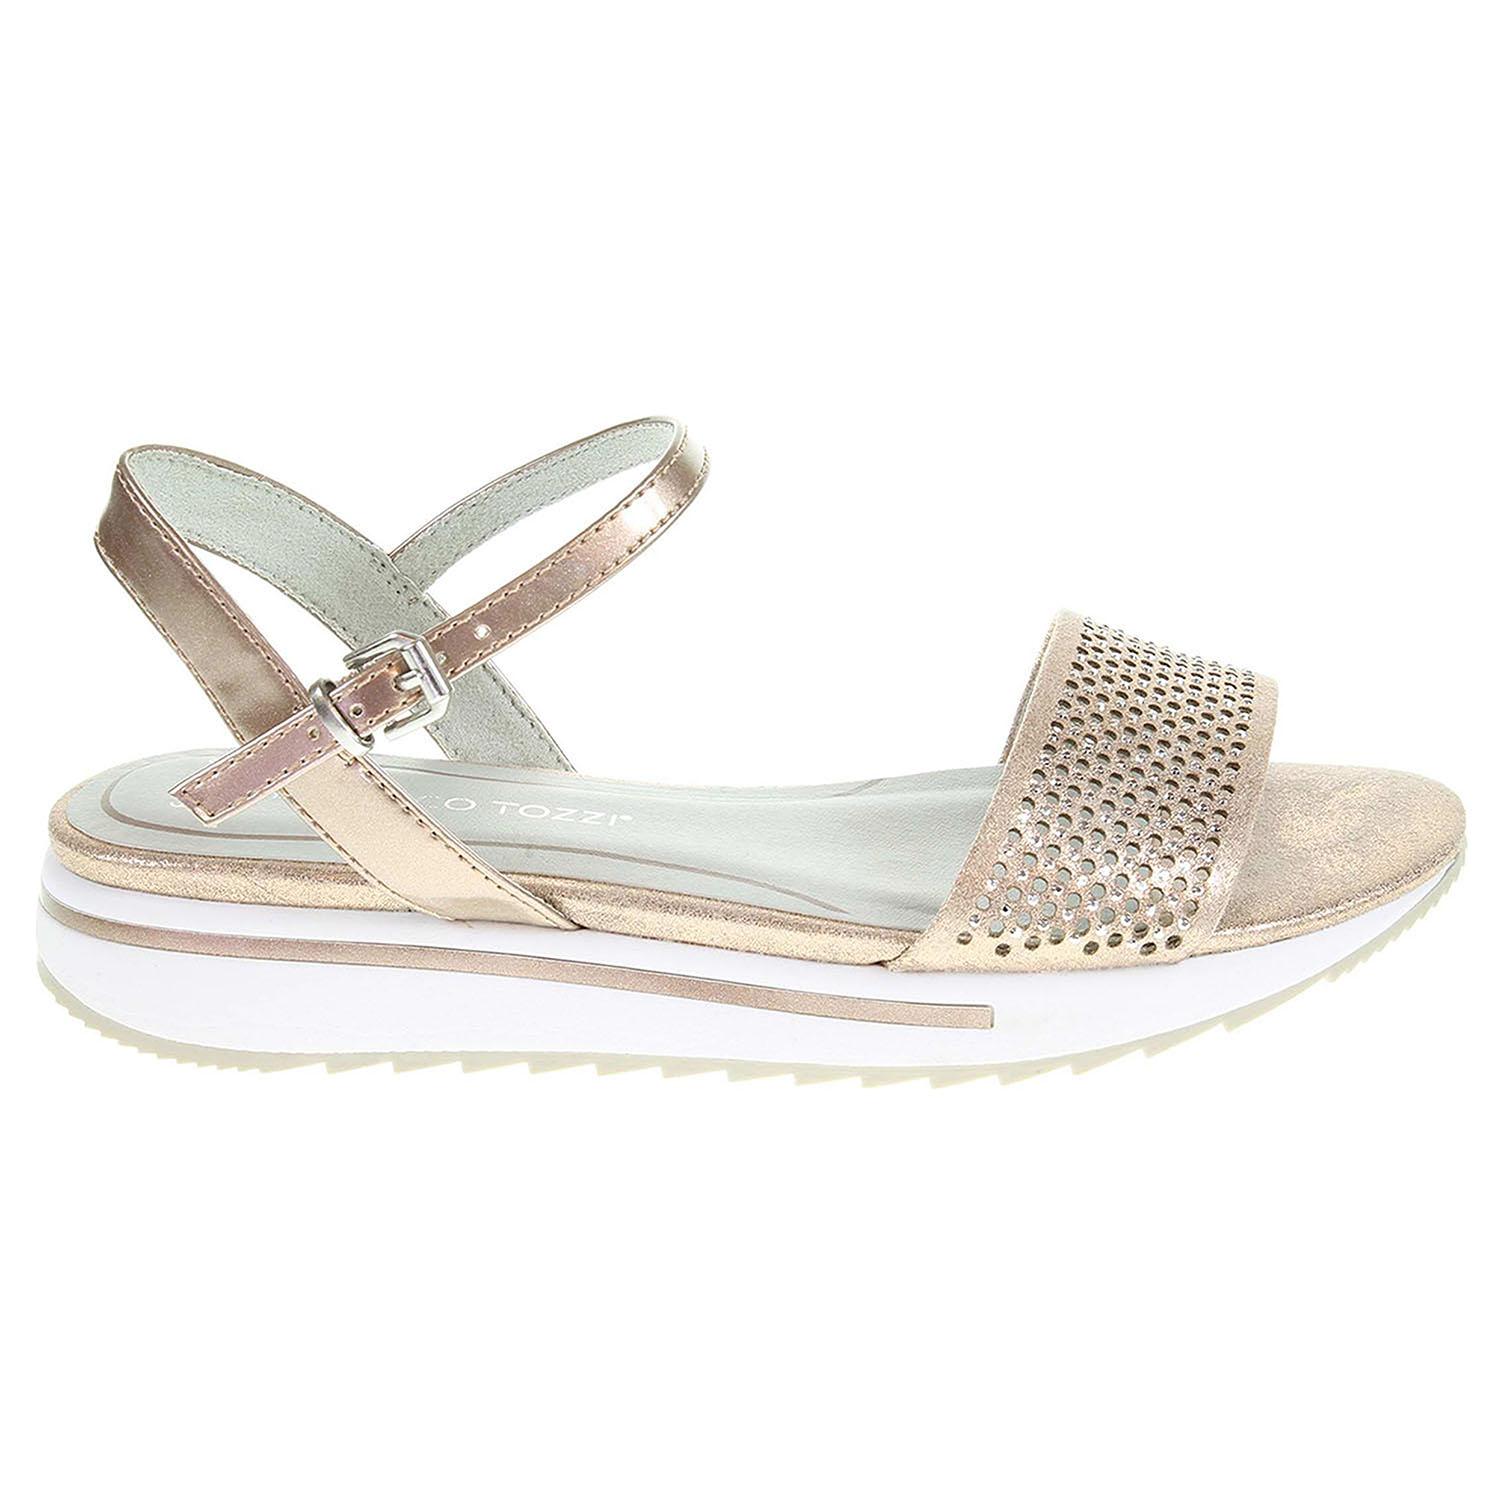 Ecco Marco Tozzi dámské sandály 2-28721-28 růžové 23801215